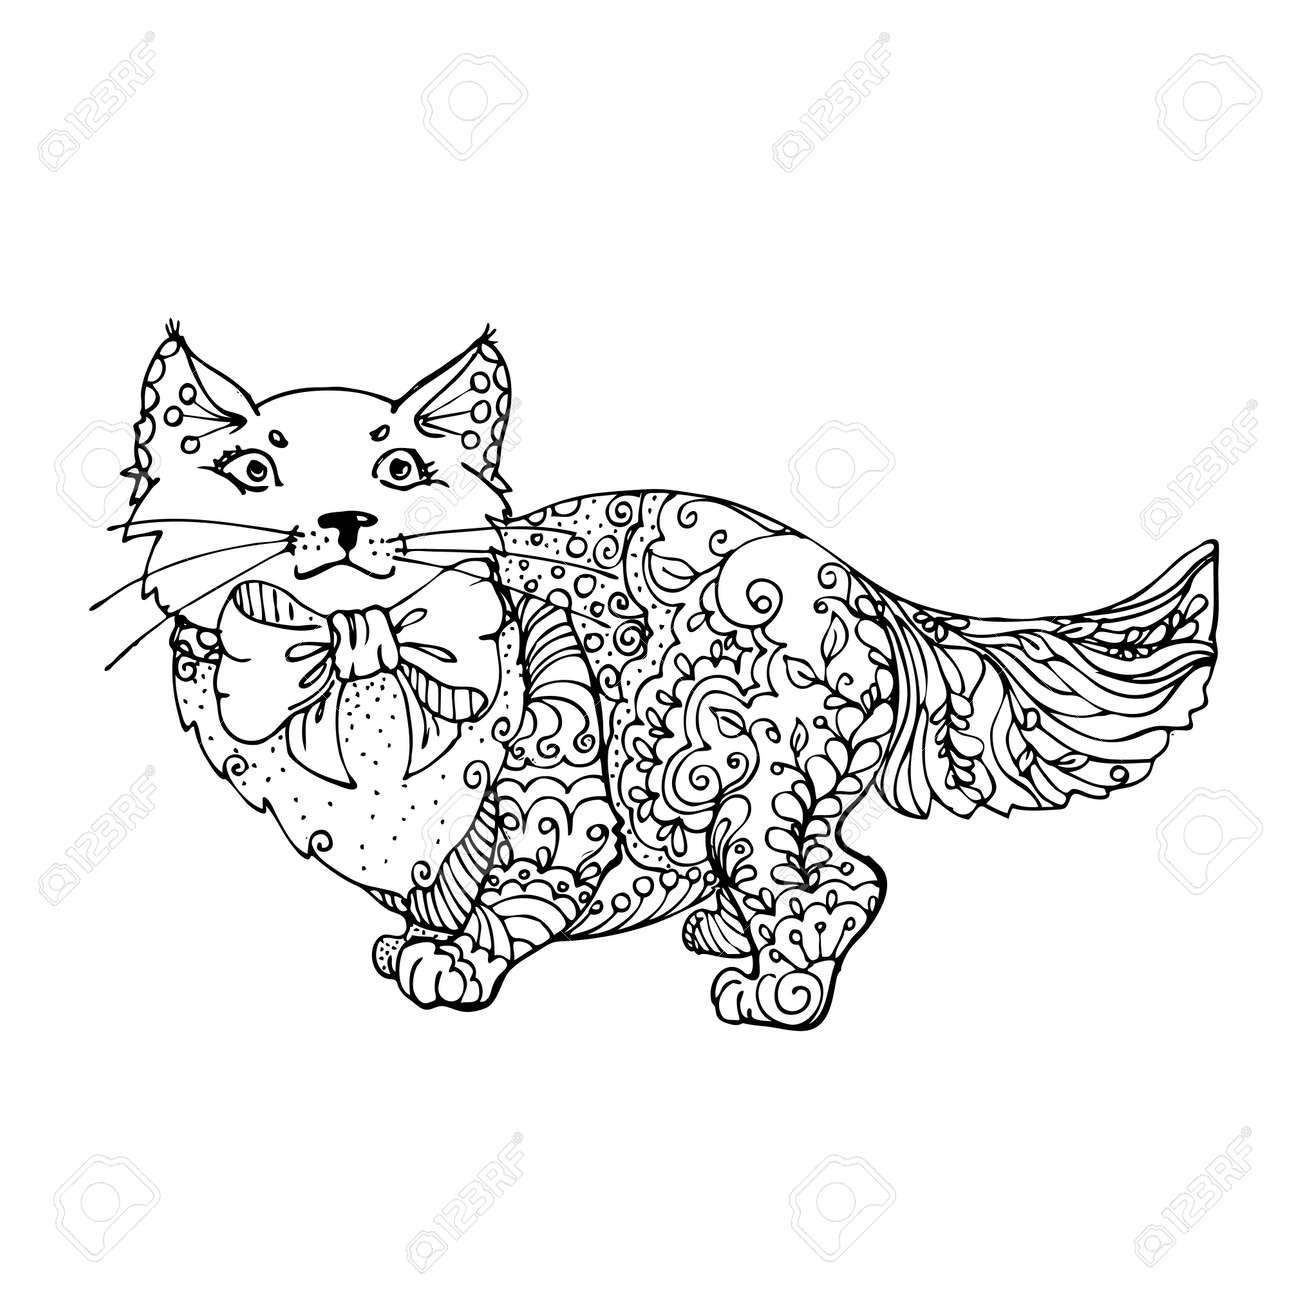 Ausmalbilder Erwachsene Katzen : Fantastisch Ausmalbilder Erwachsene Katze Zeitgen Ssisch